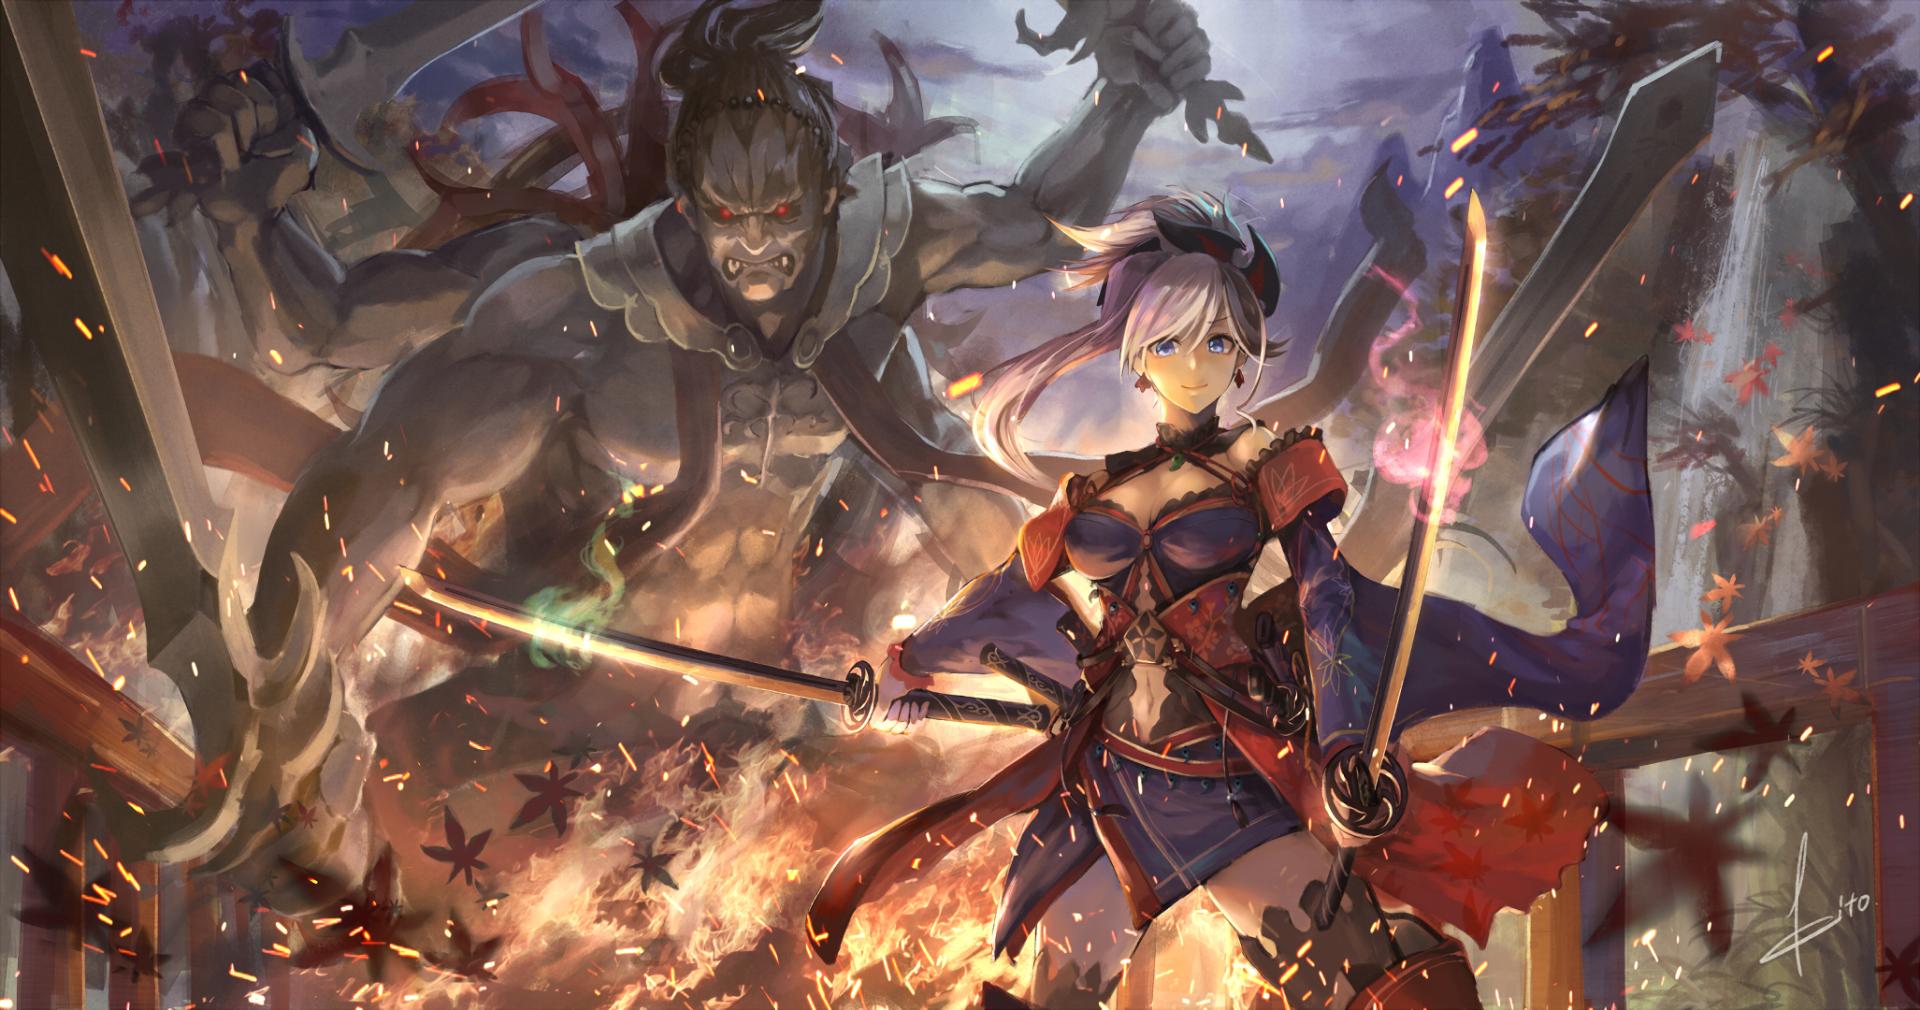 Anime Fate Grand Order Fate Series Miyamoto Musashi Wallpaper Musashi Miyamoto Musashi Anime